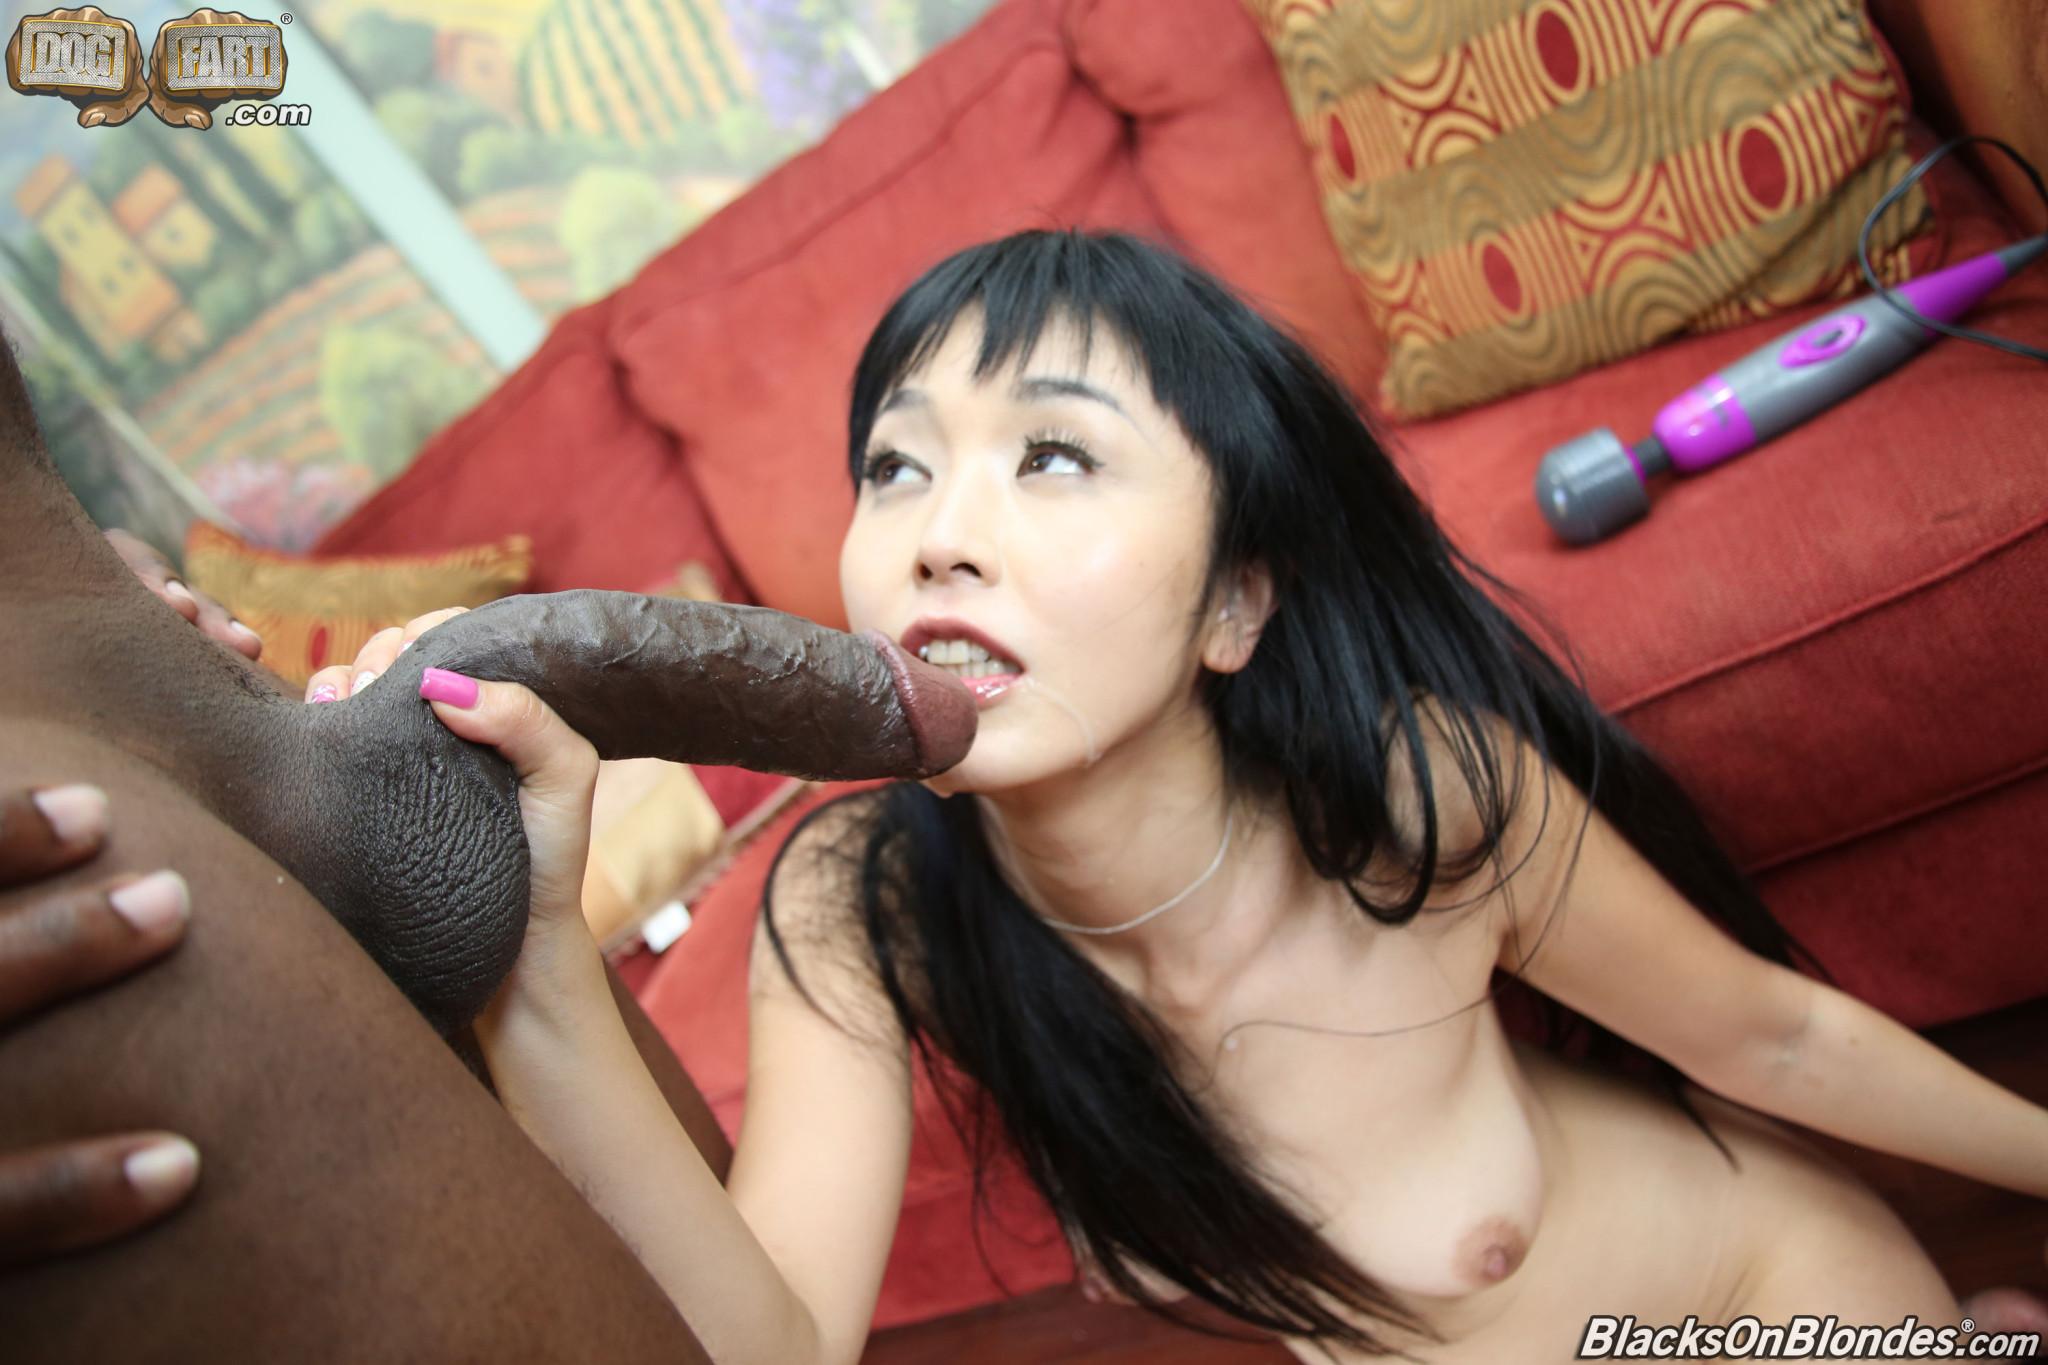 Marica Hase - Азиатки - Порно галерея № 3530279